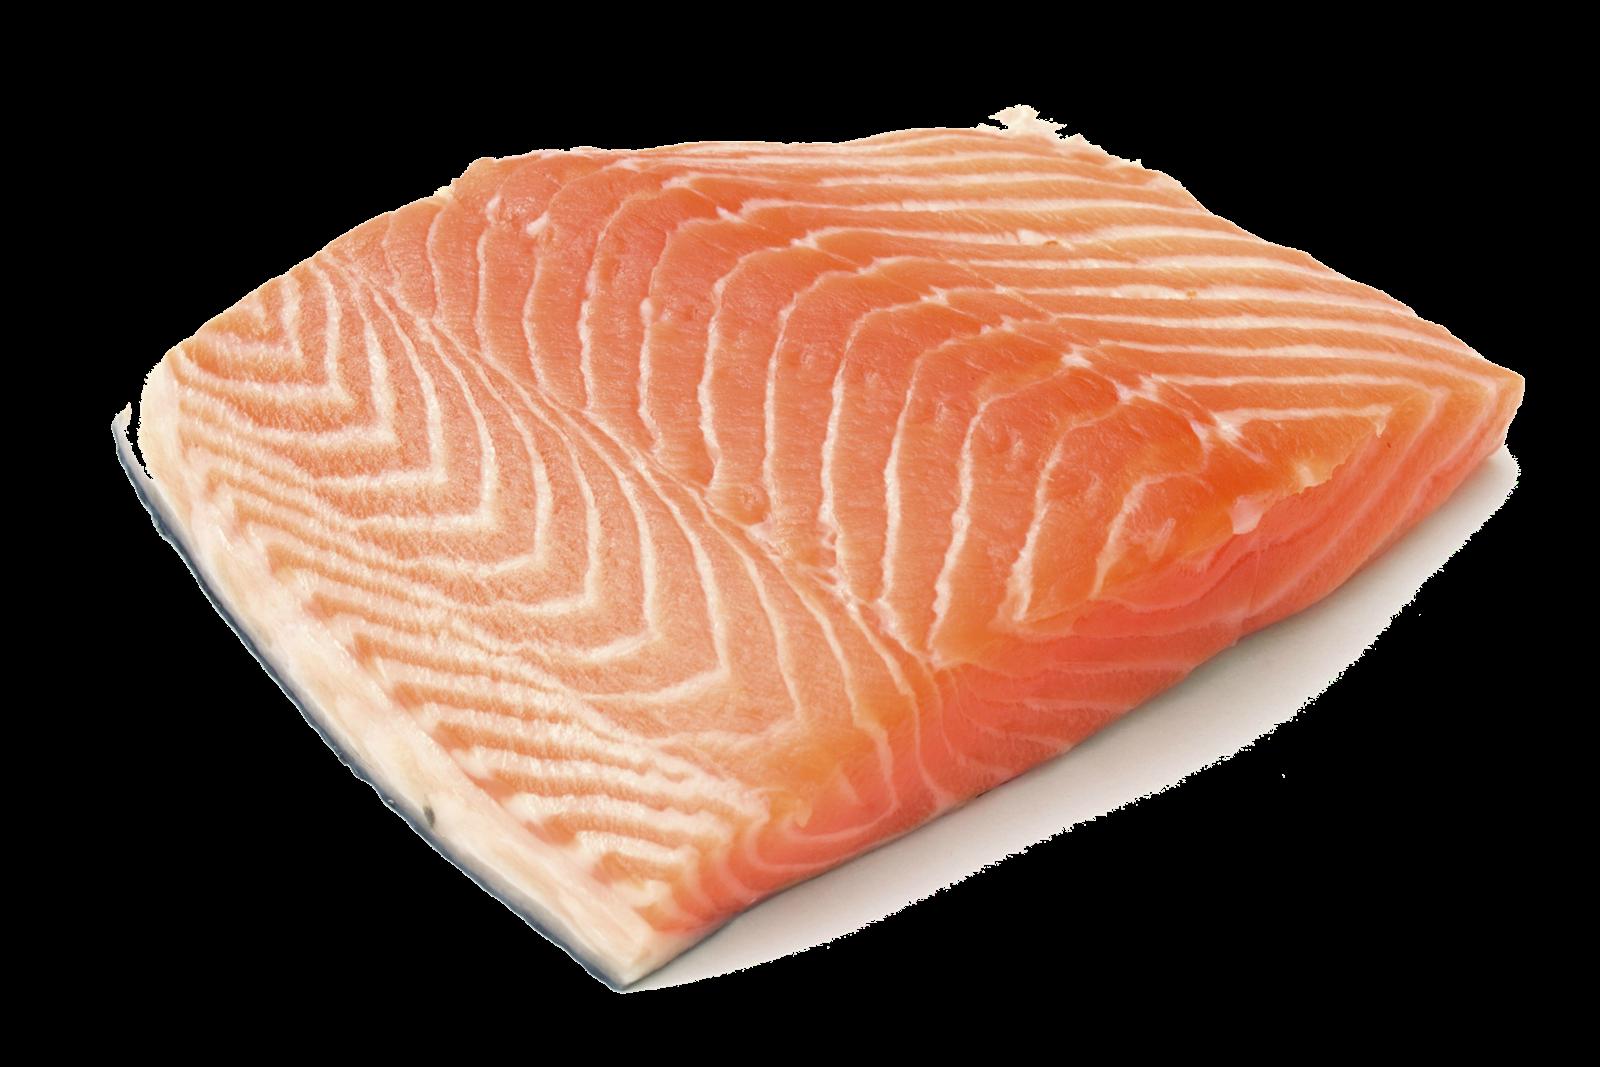 Evaluation clipart transparent. Fish meat png mart